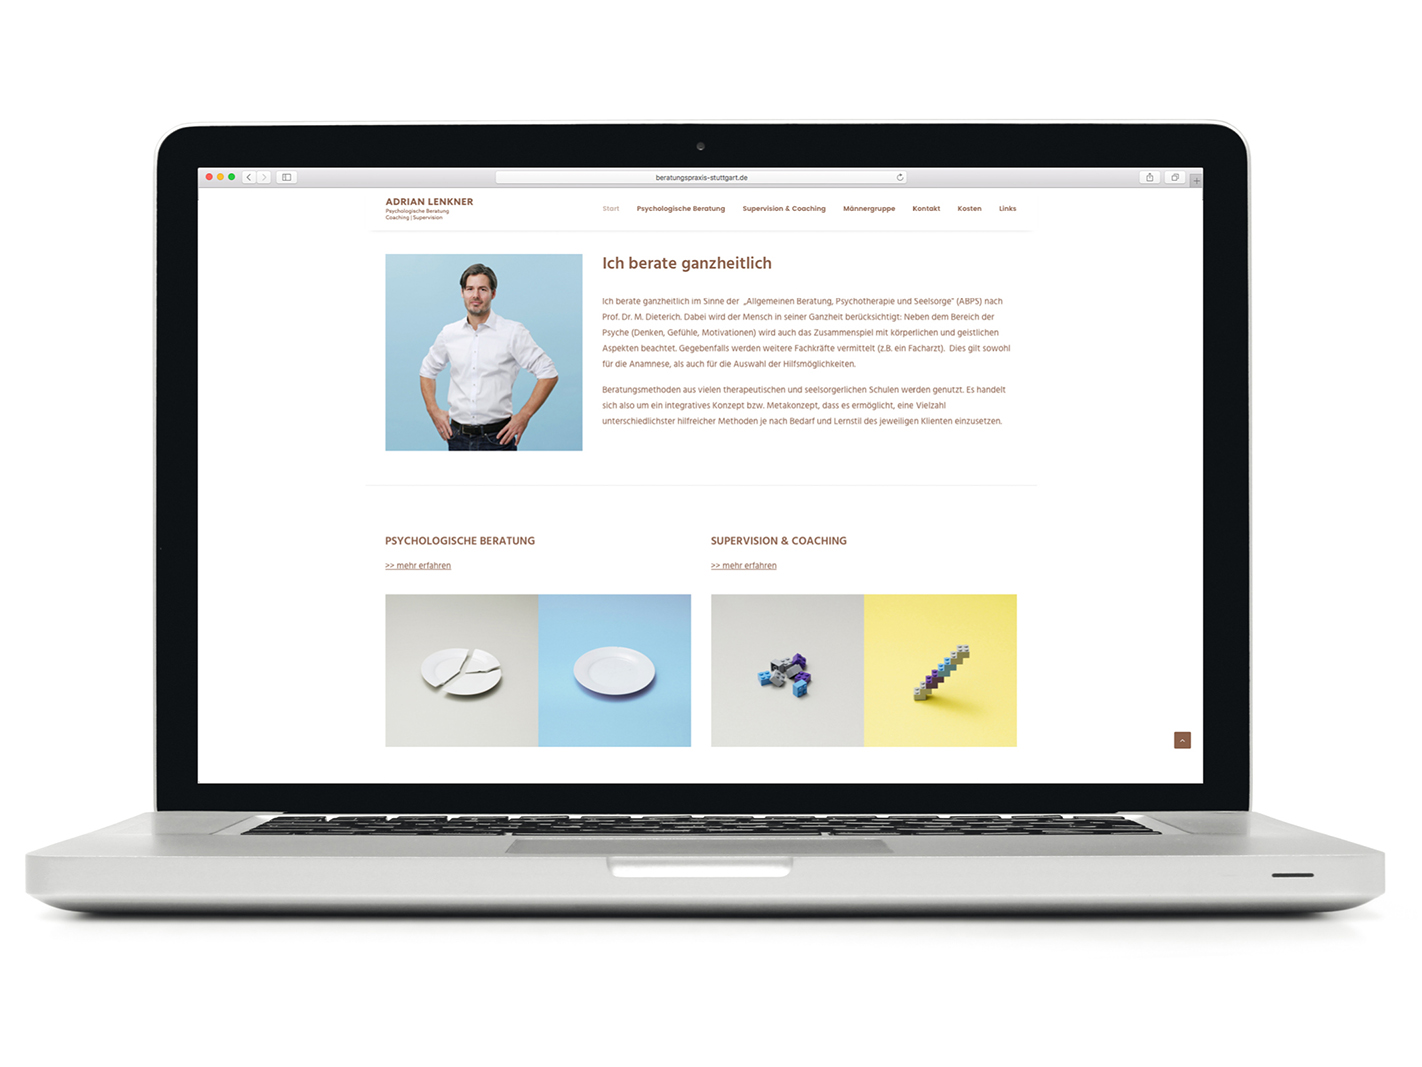 ATK-LENKNER-coaching-beratung-Corporate-Design-109.jpg